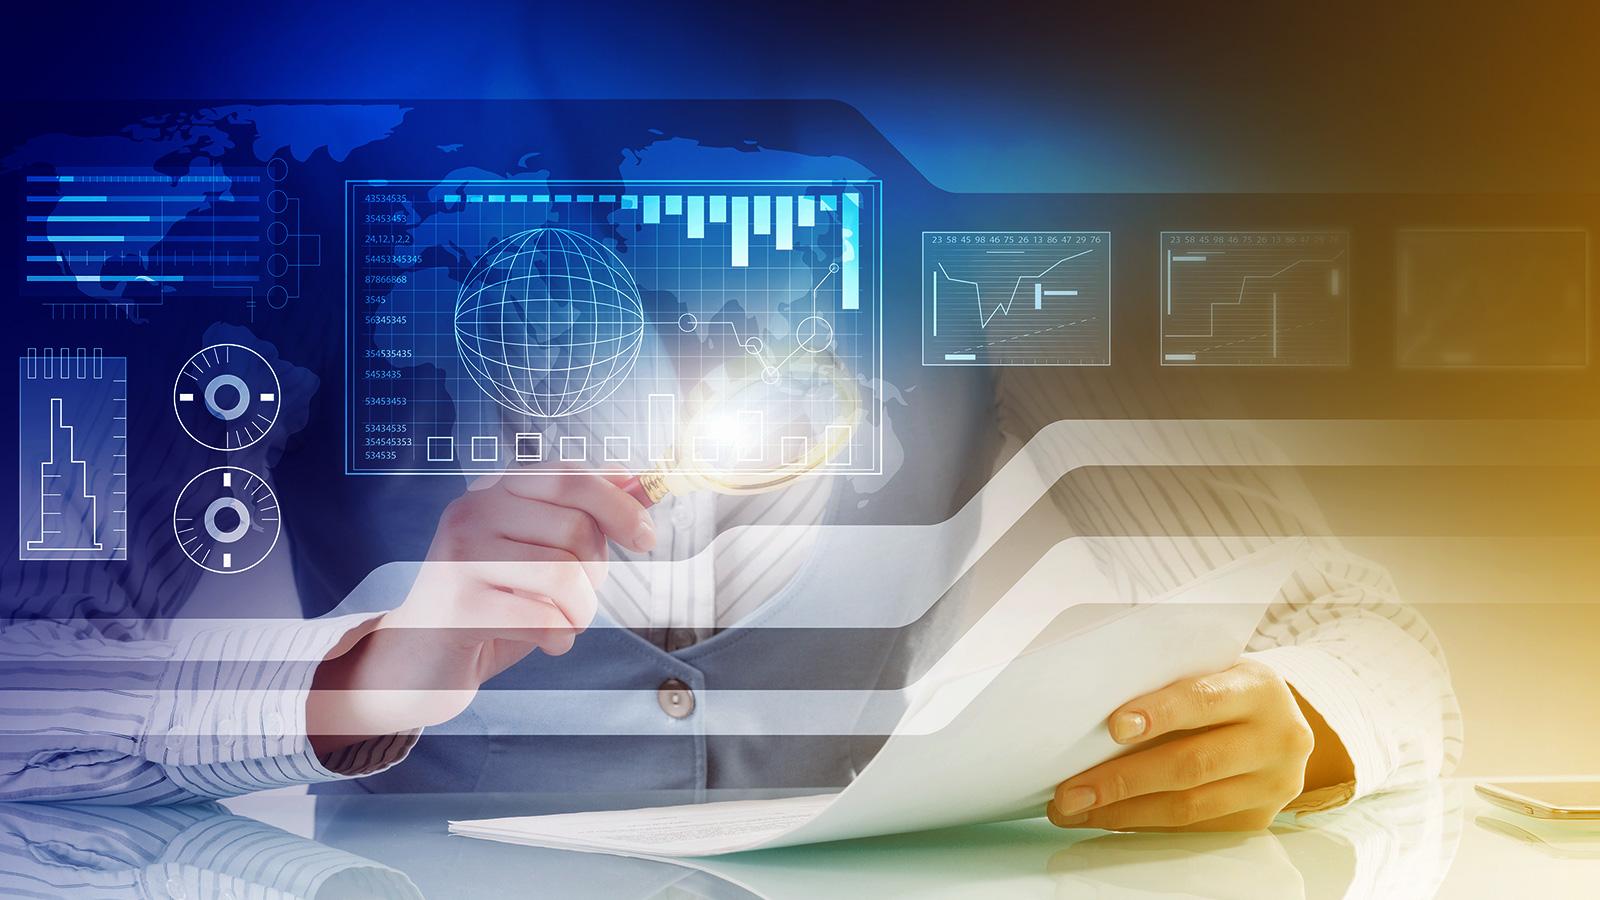 Fusionex International: Unleashing The Ability Of Large Information